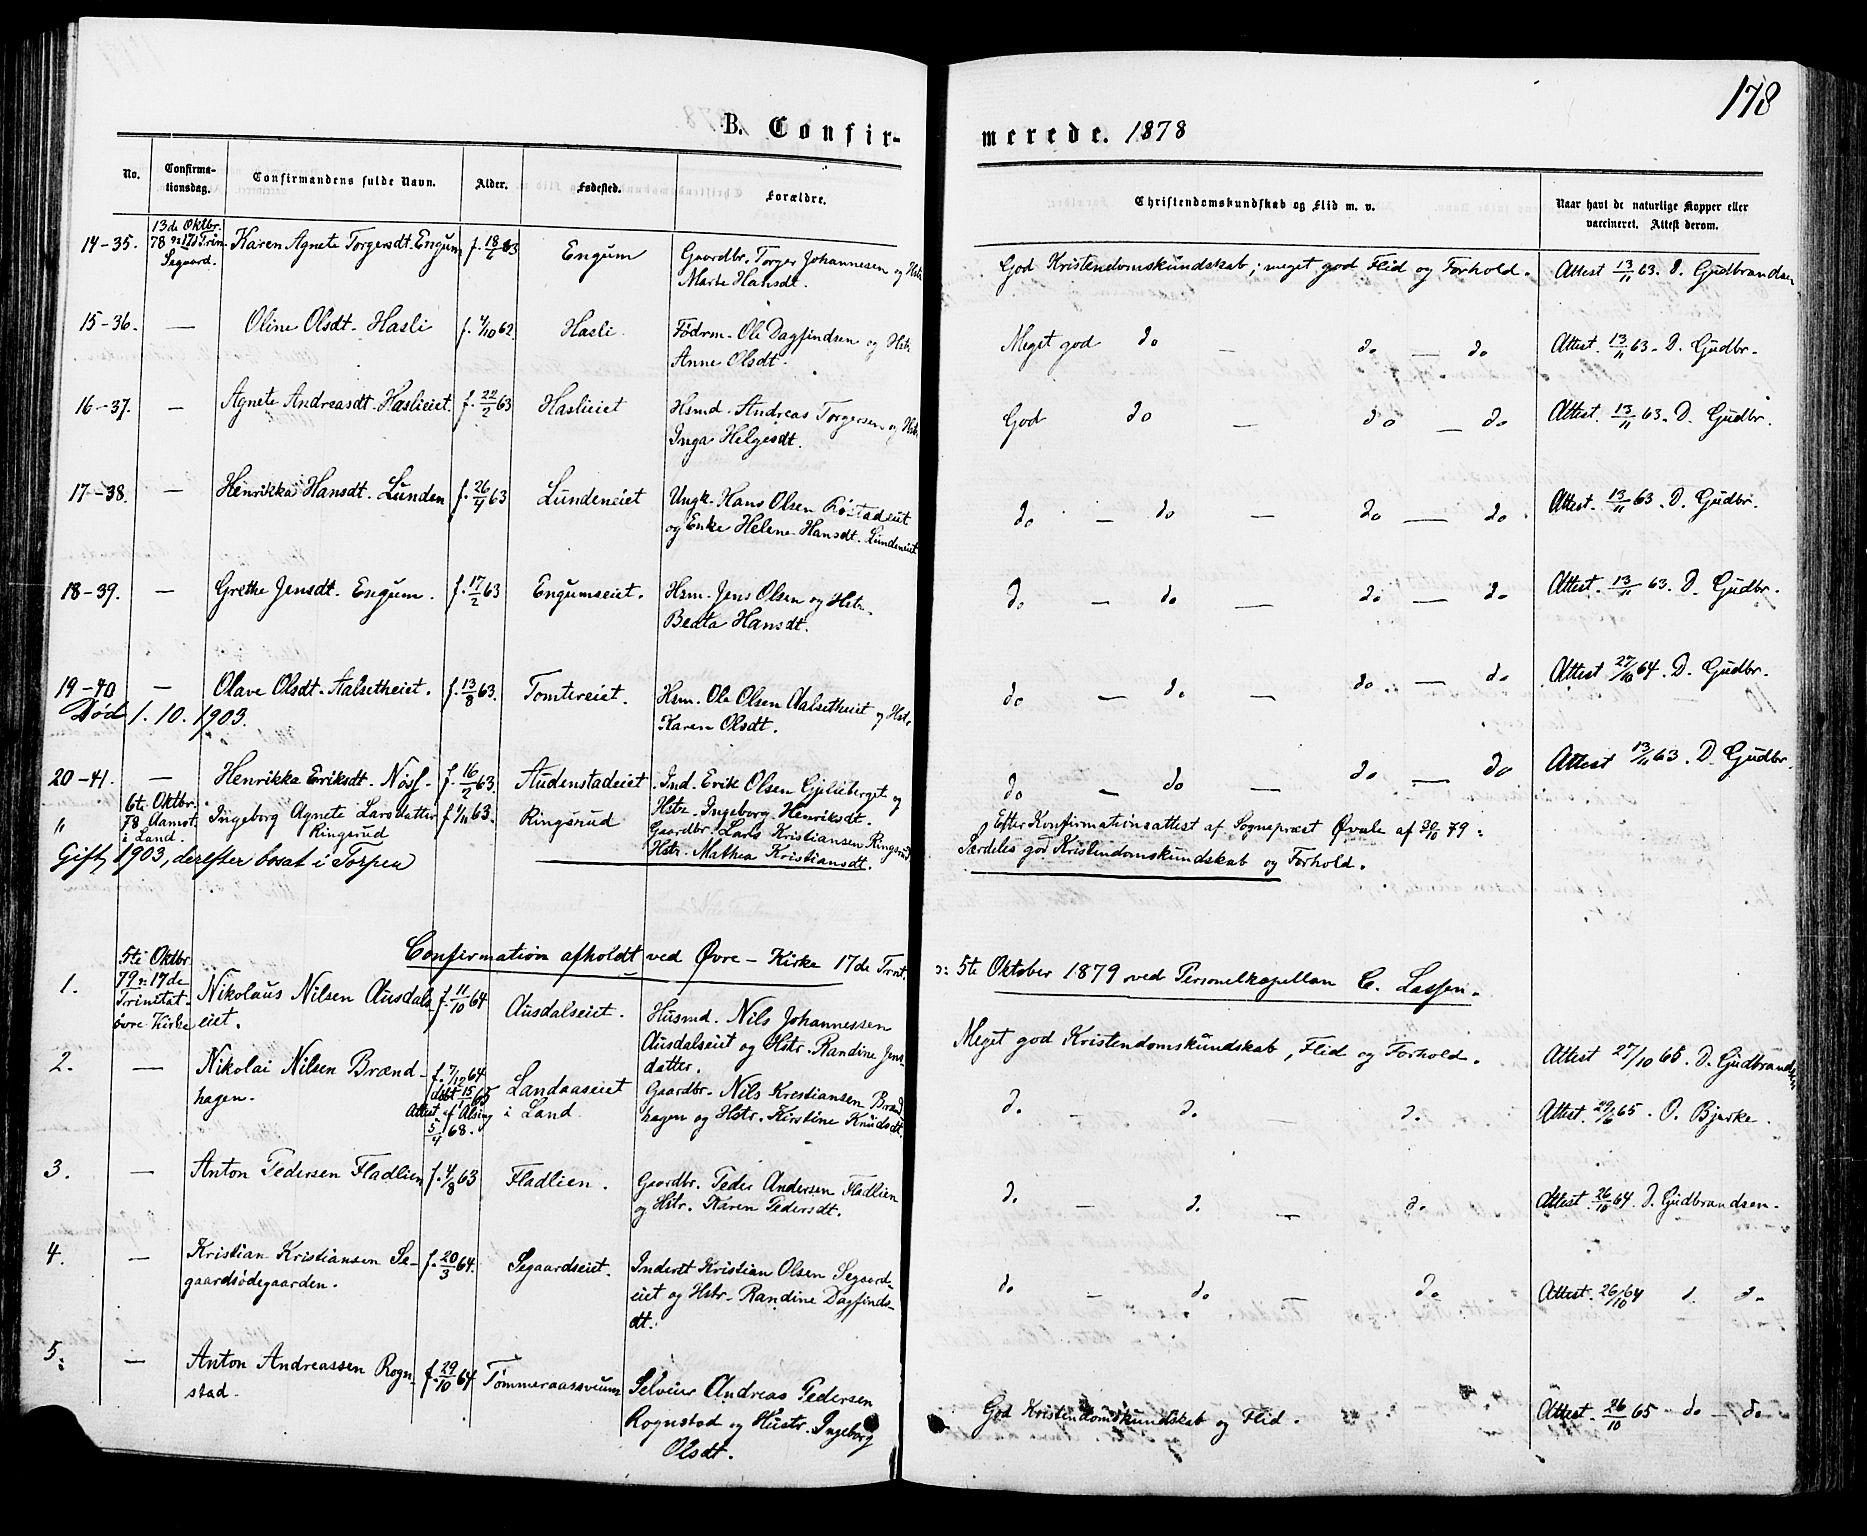 SAH, Biri prestekontor, Ministerialbok nr. 6, 1877-1886, s. 178